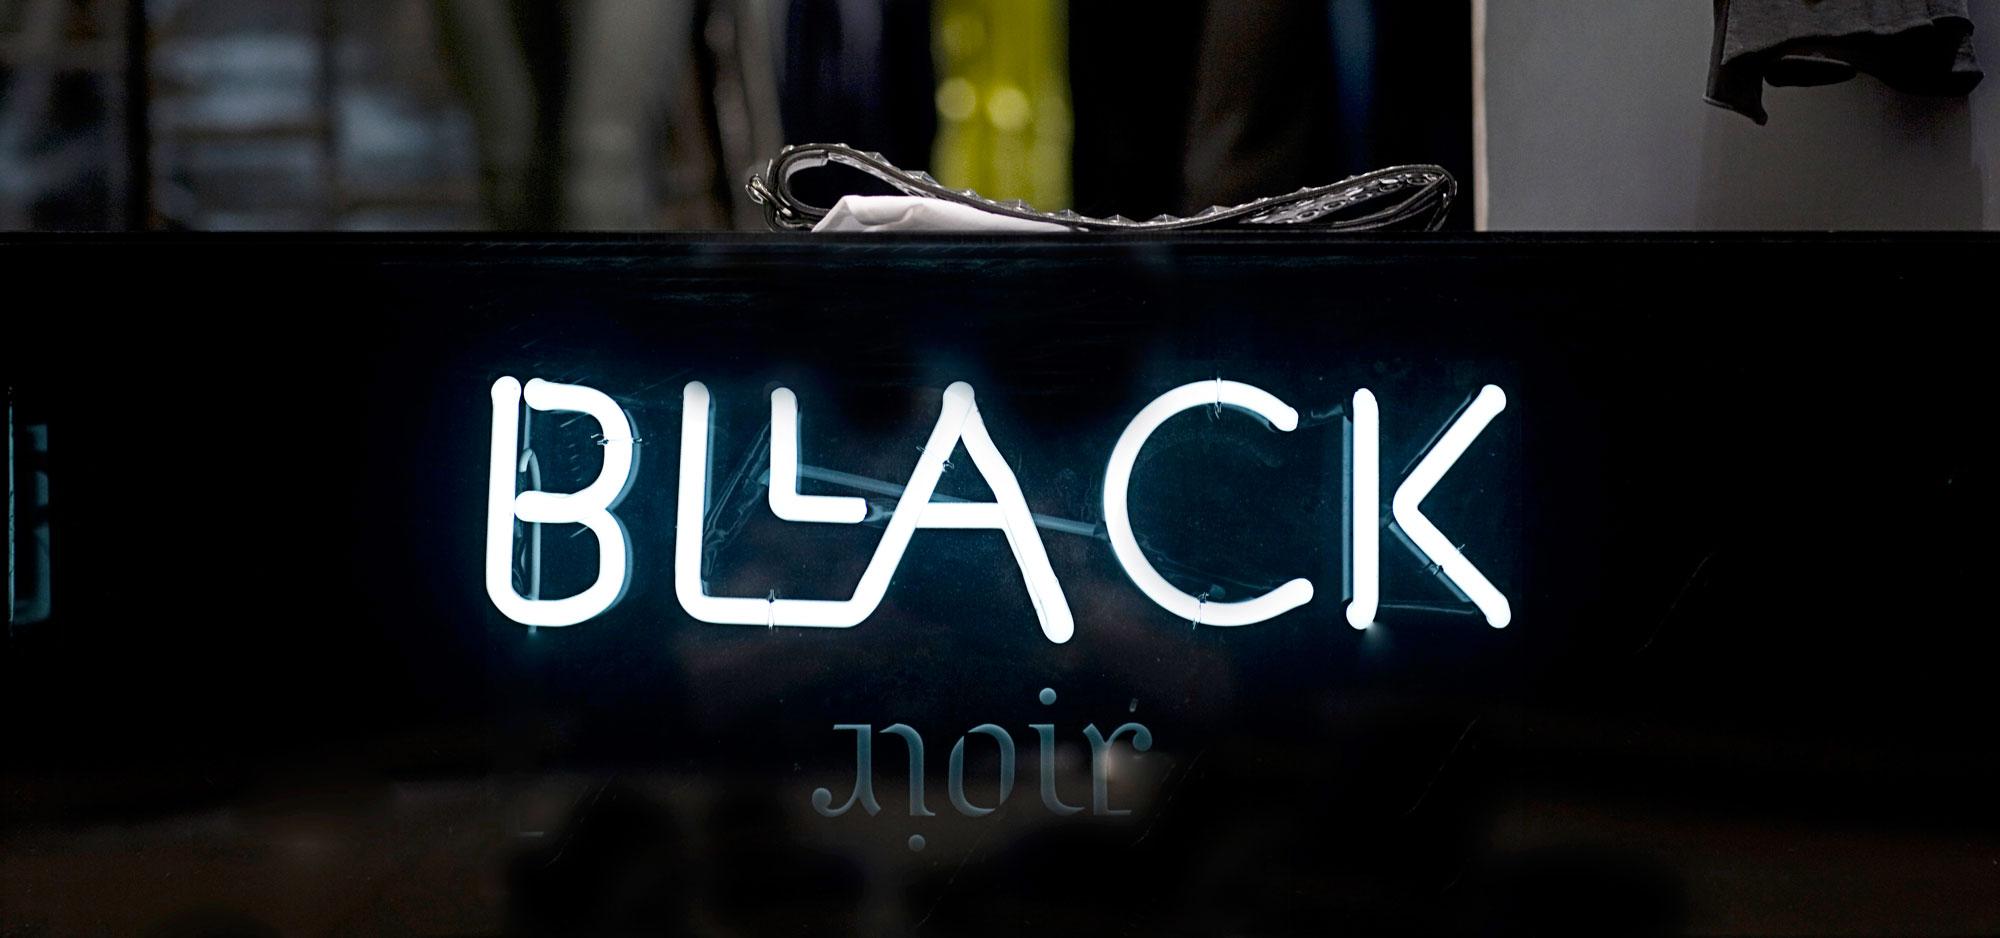 Close-up of the logo of fashion brand Bllack Noir